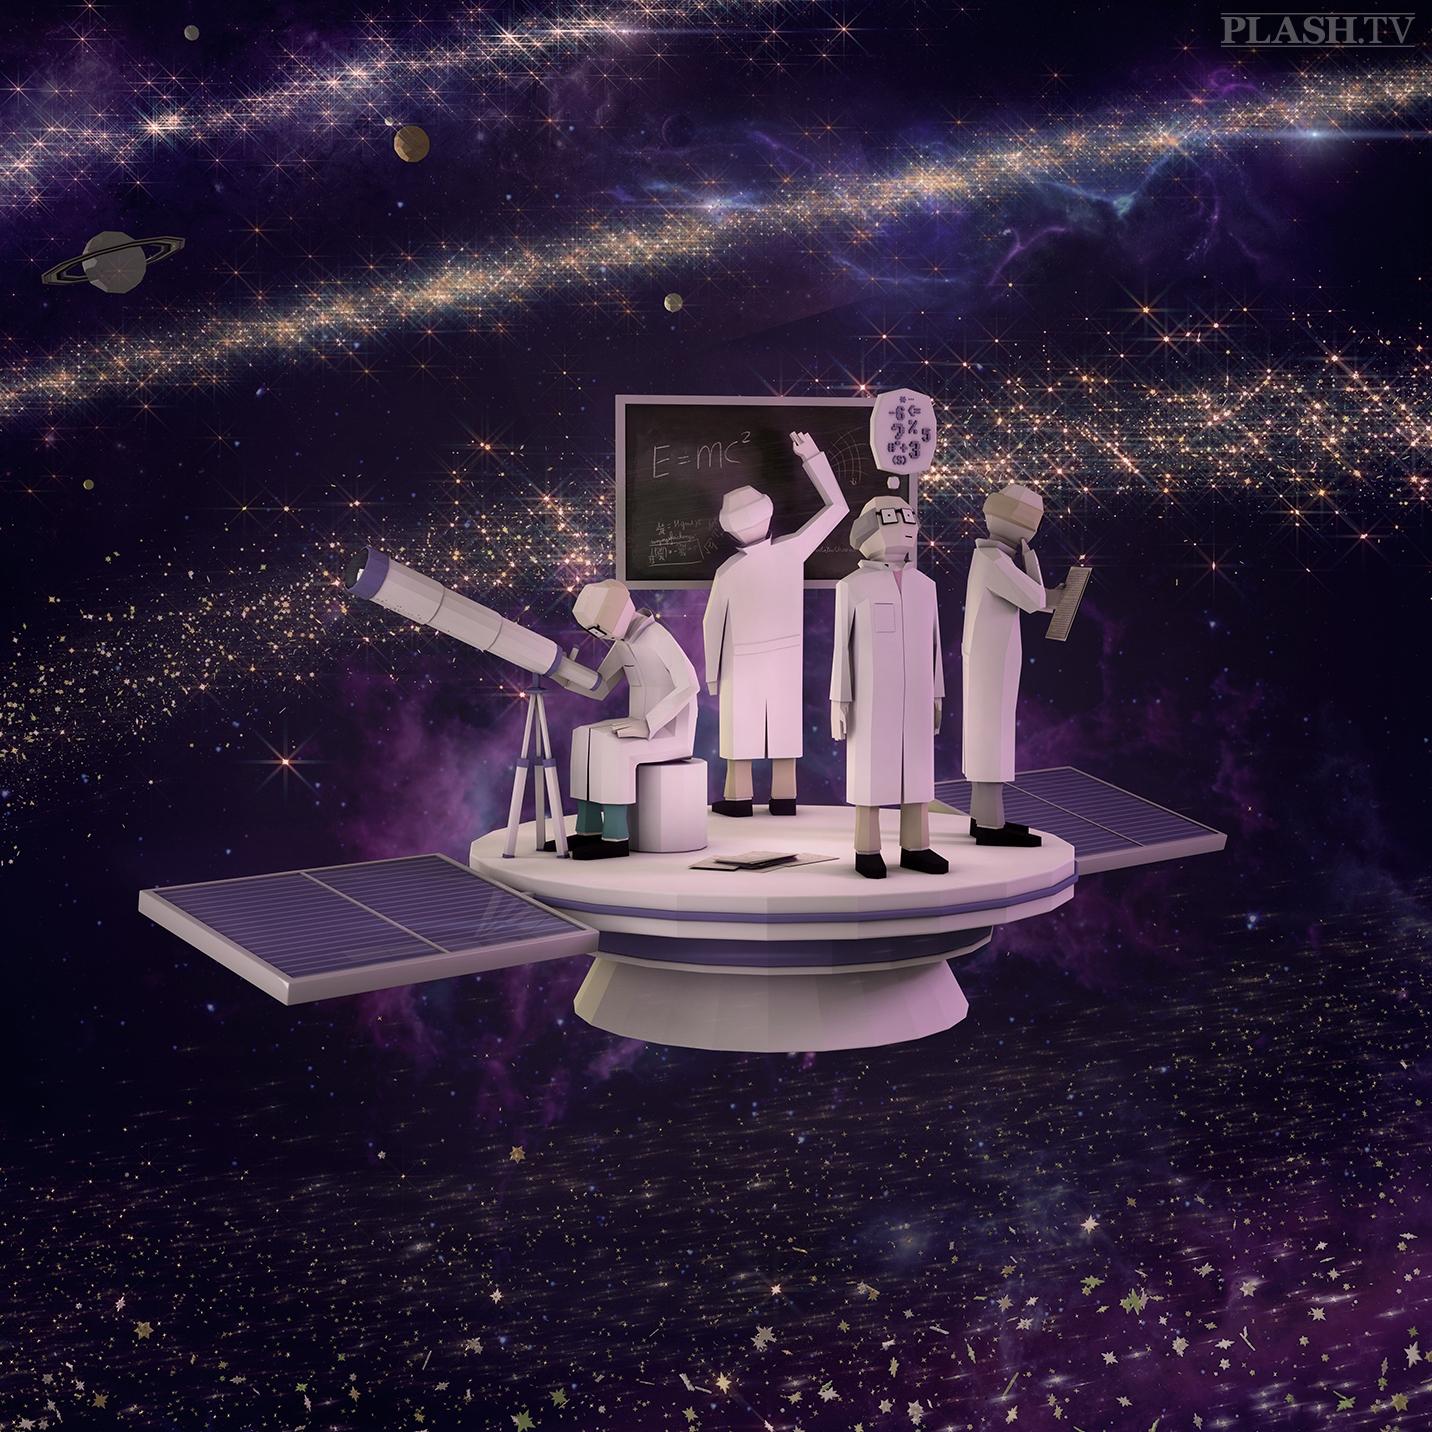 3d, 3dart, space, satellite, science - plashtv | ello